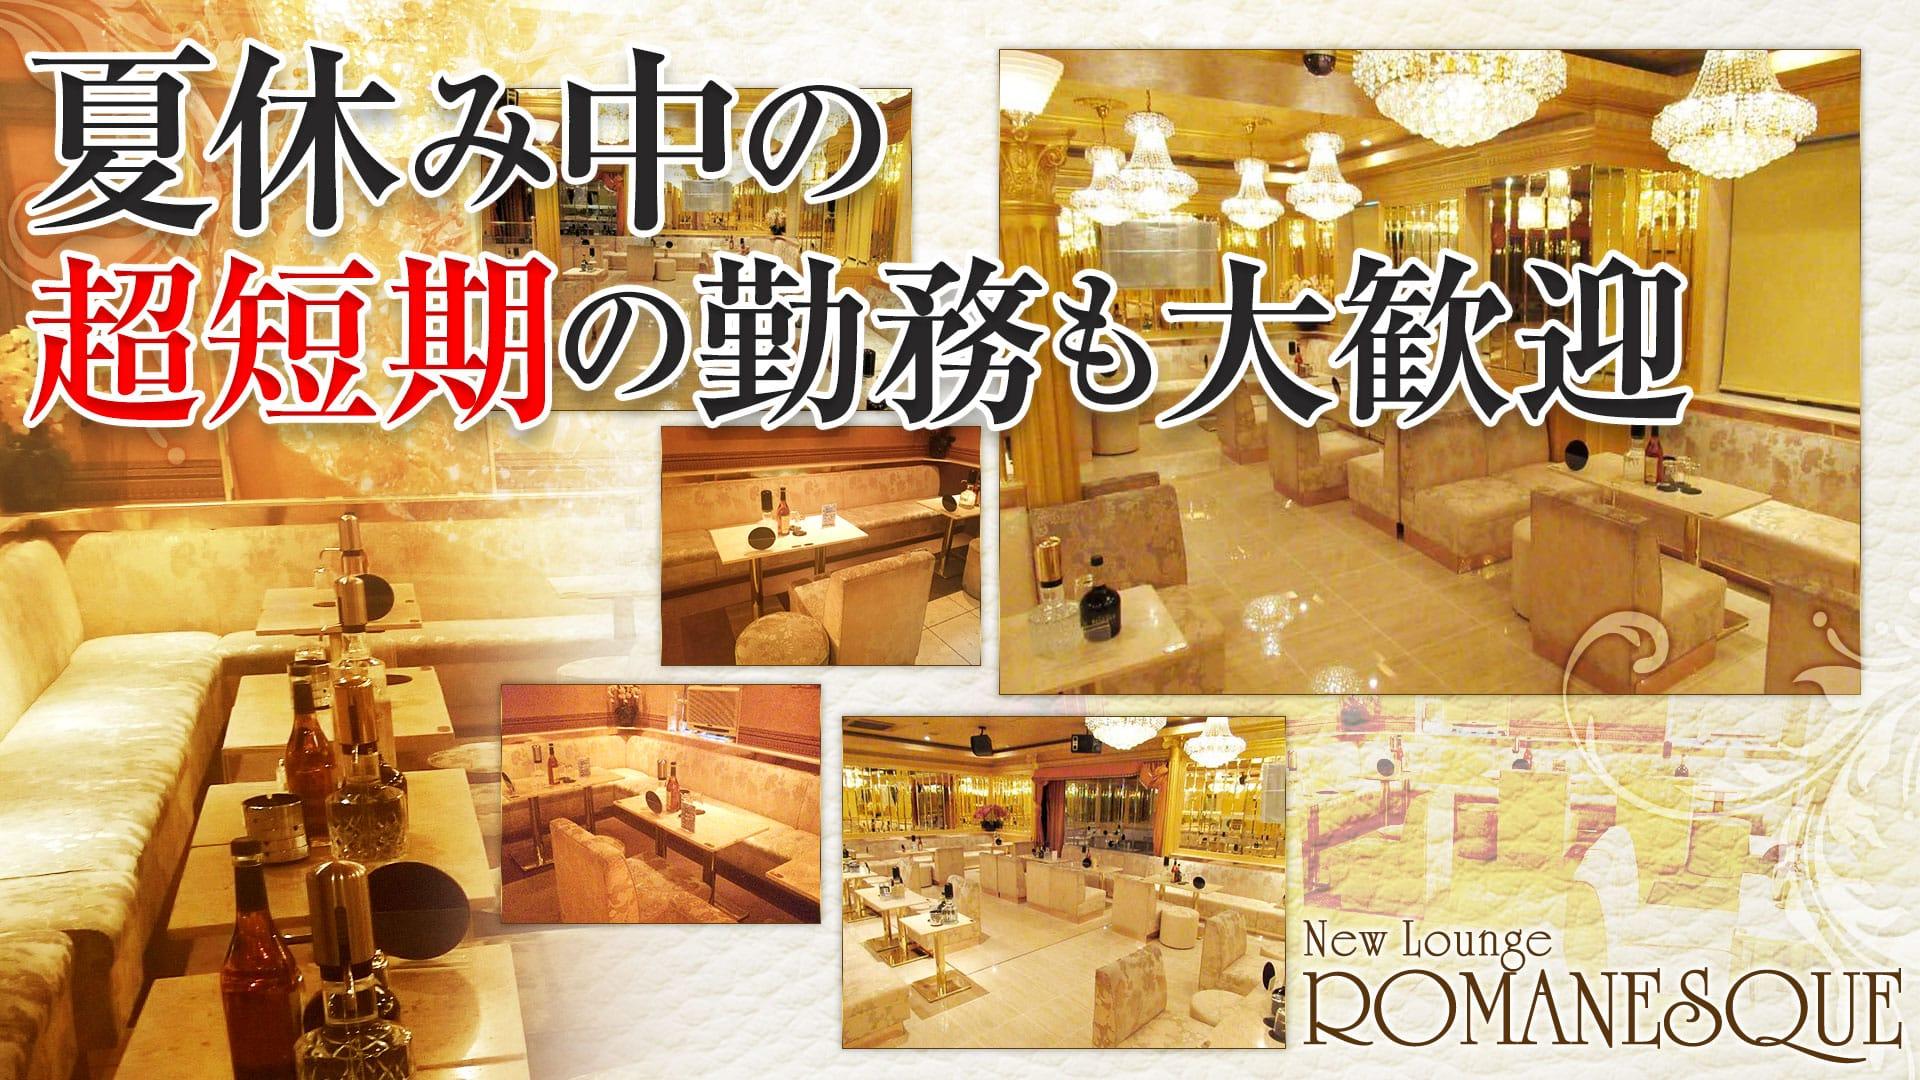 New Lounge ROMANESQUE(ロマネスク)  西船橋キャバクラ TOP画像